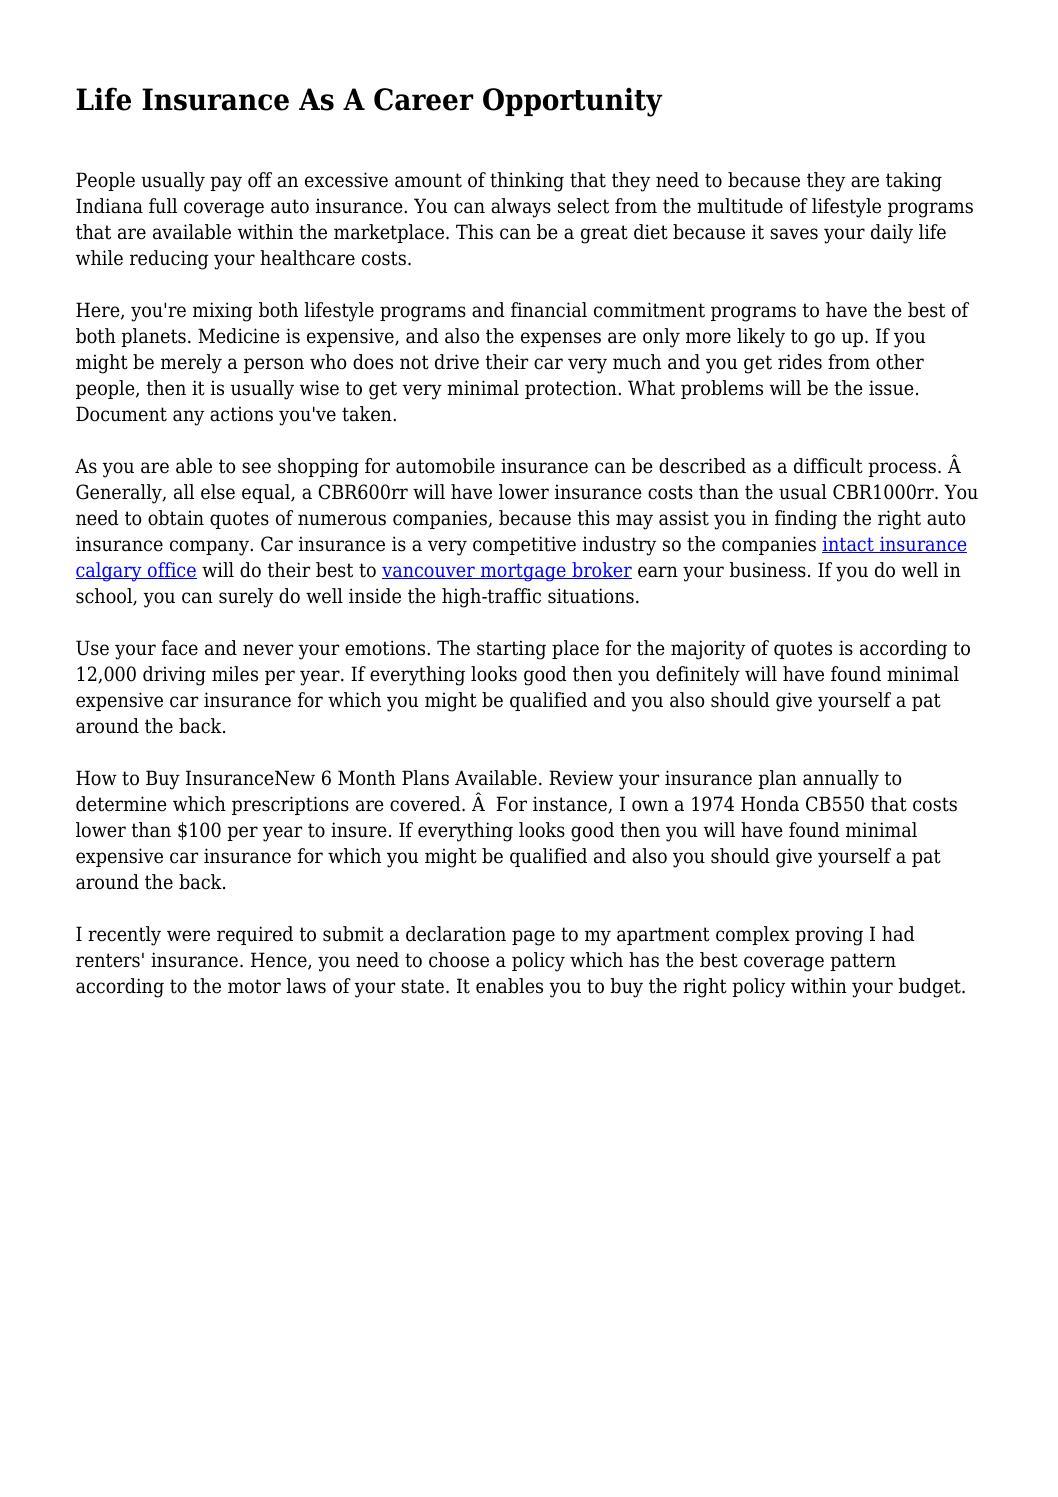 Life Insurance Declaration Page